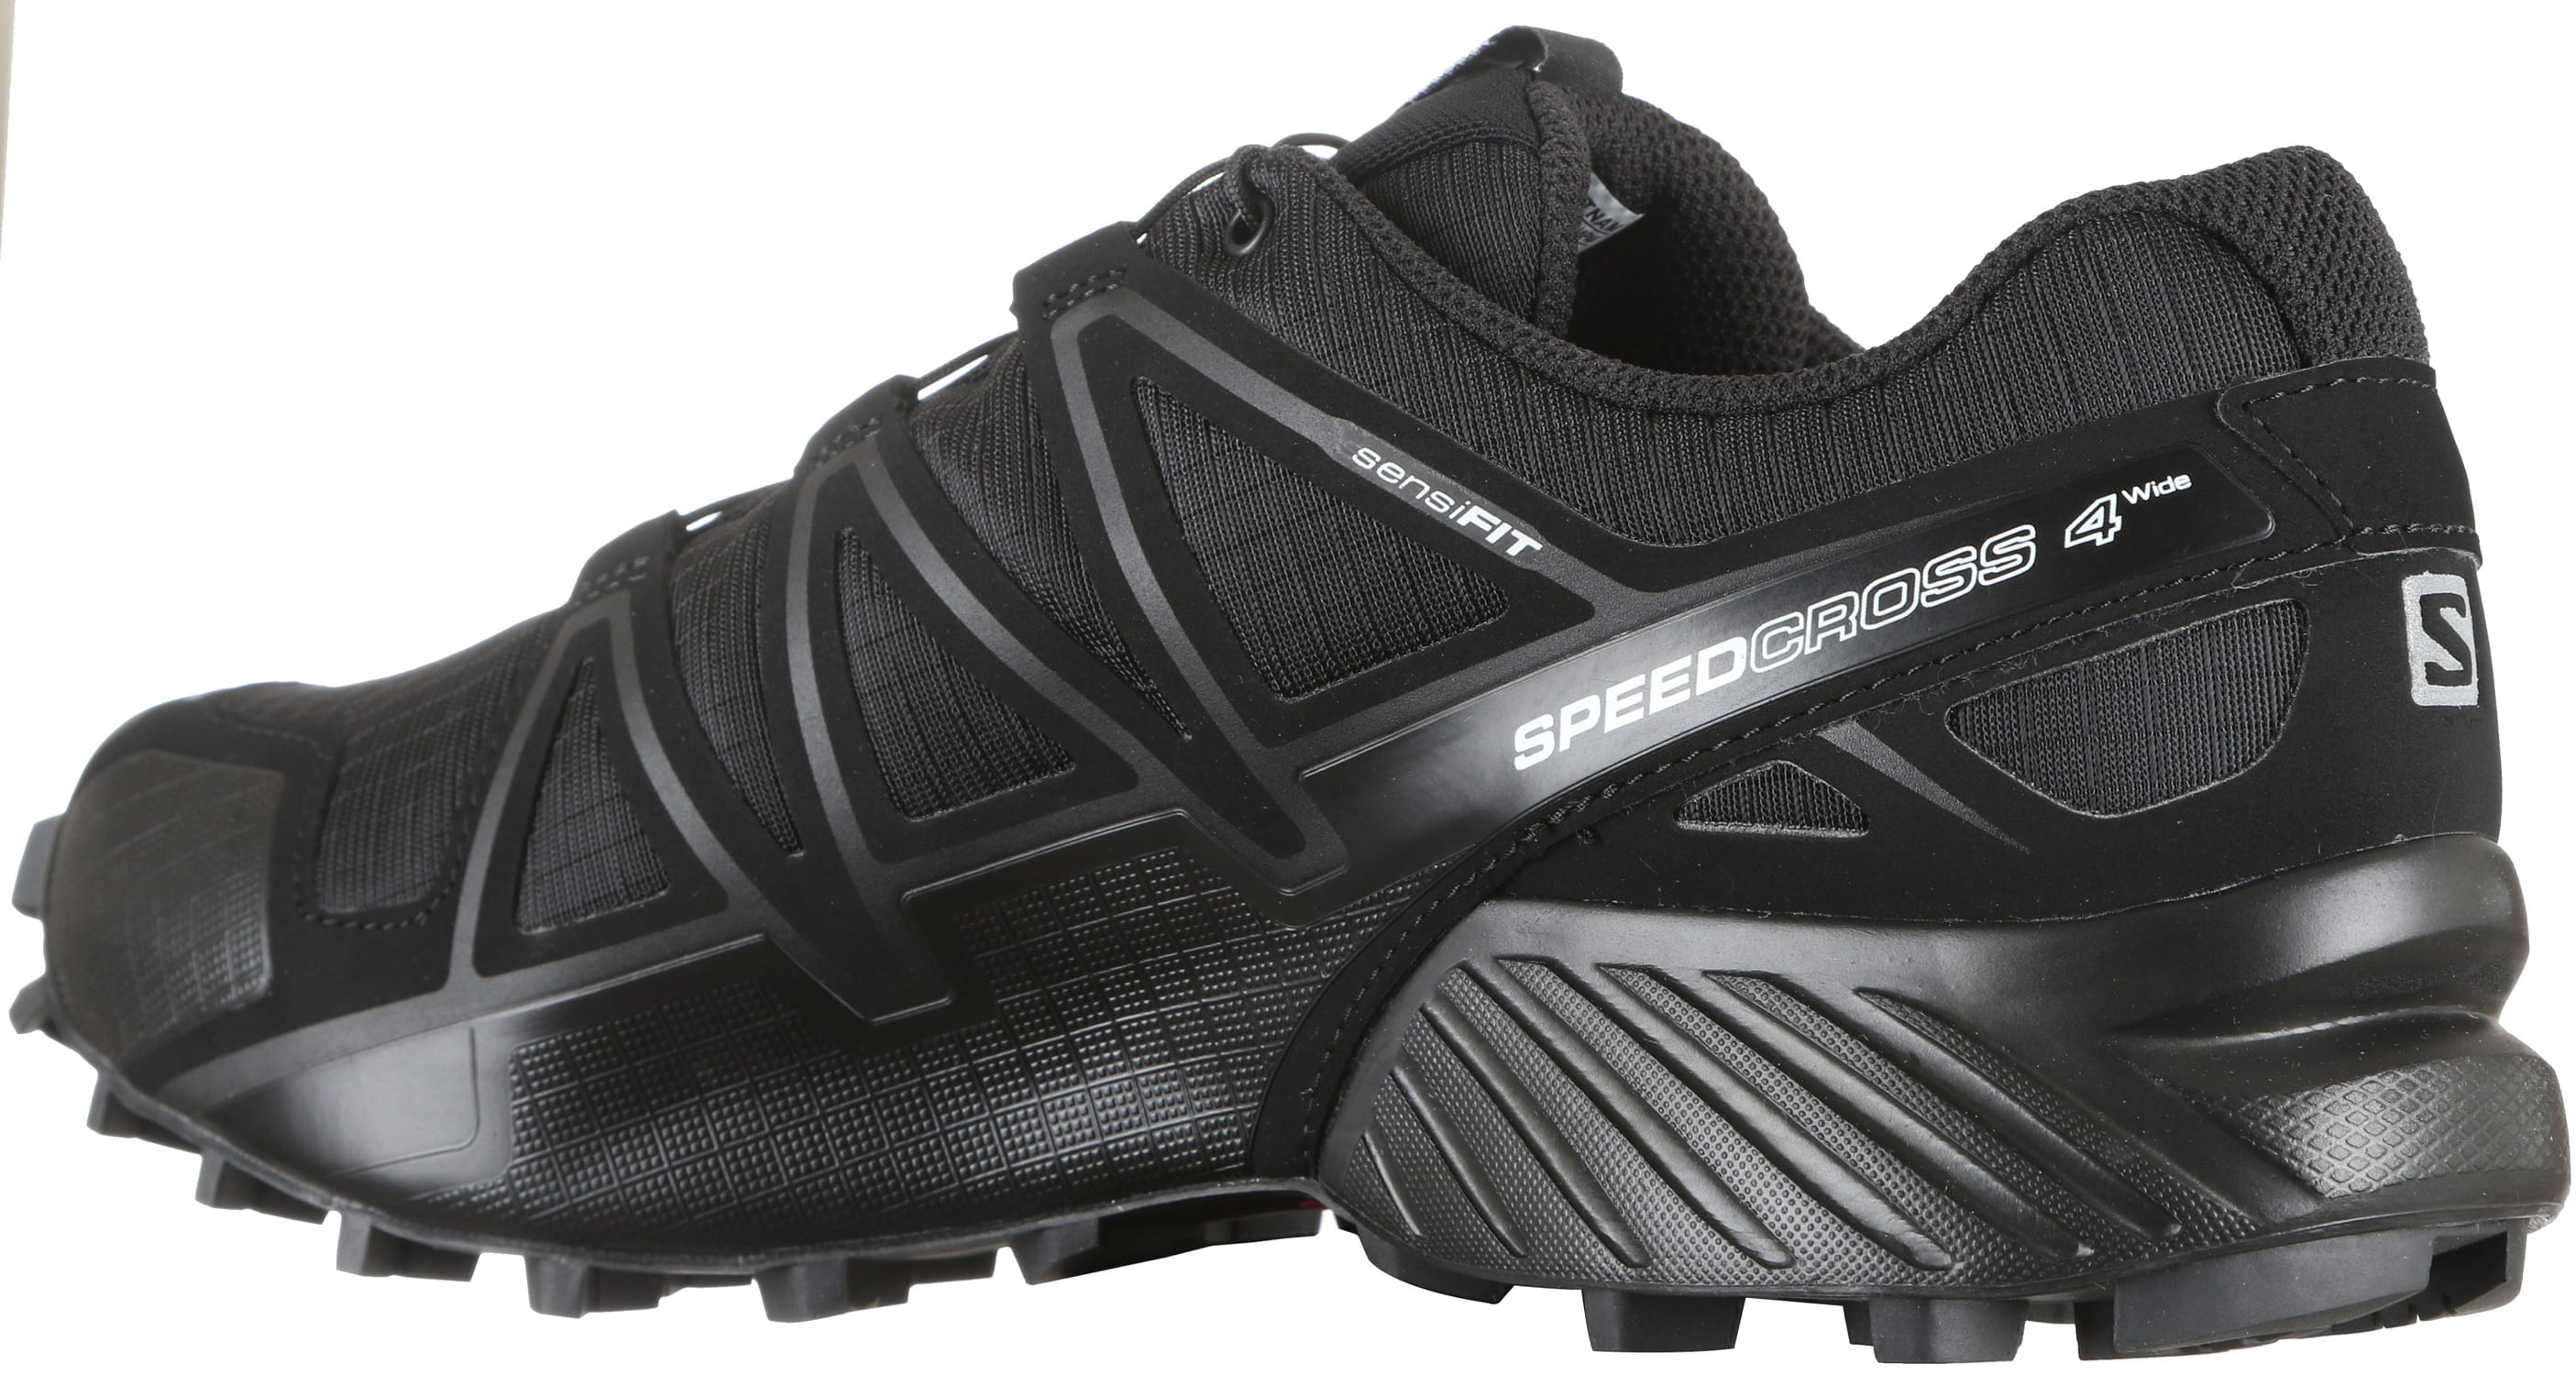 Salomon Speedcross 4 Wide Trail Running Shoes 2019